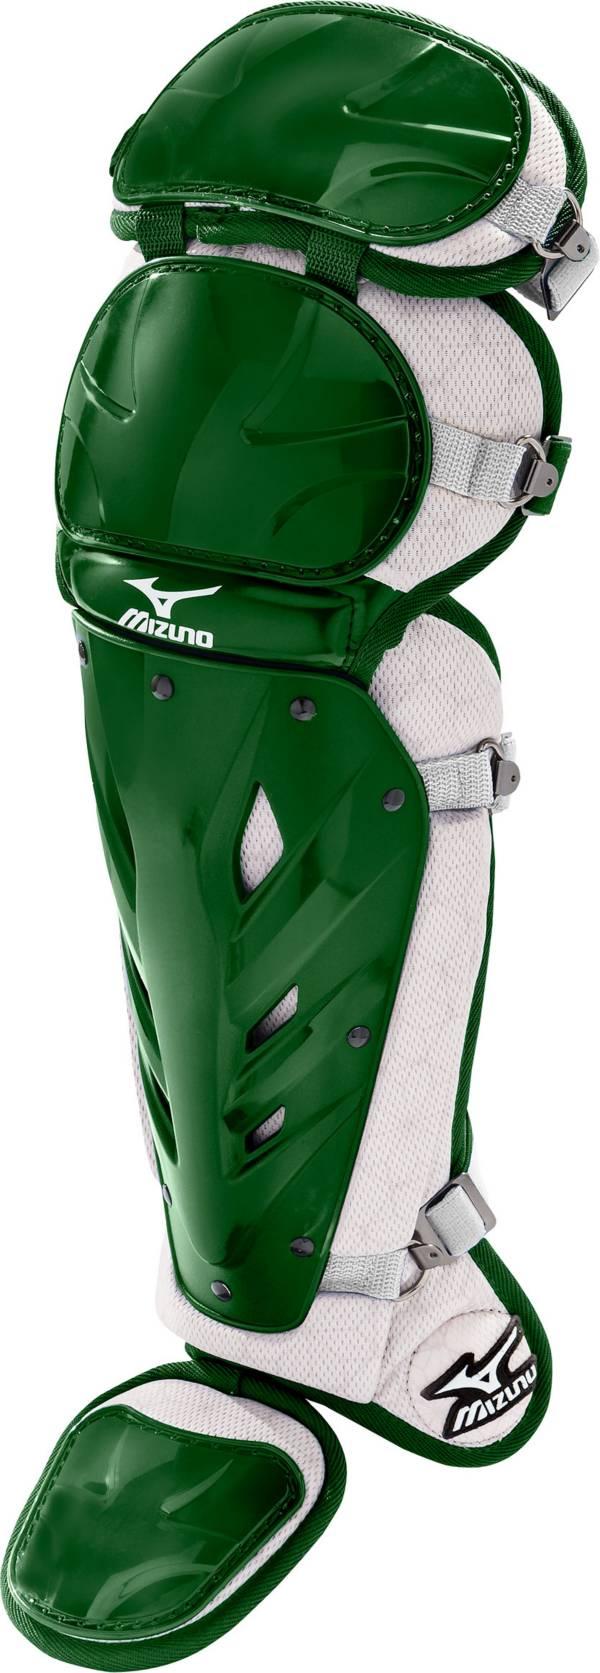 Mizuno Women's 16'' MSSGW1600 Fastpitch Catcher's Leg Guards product image